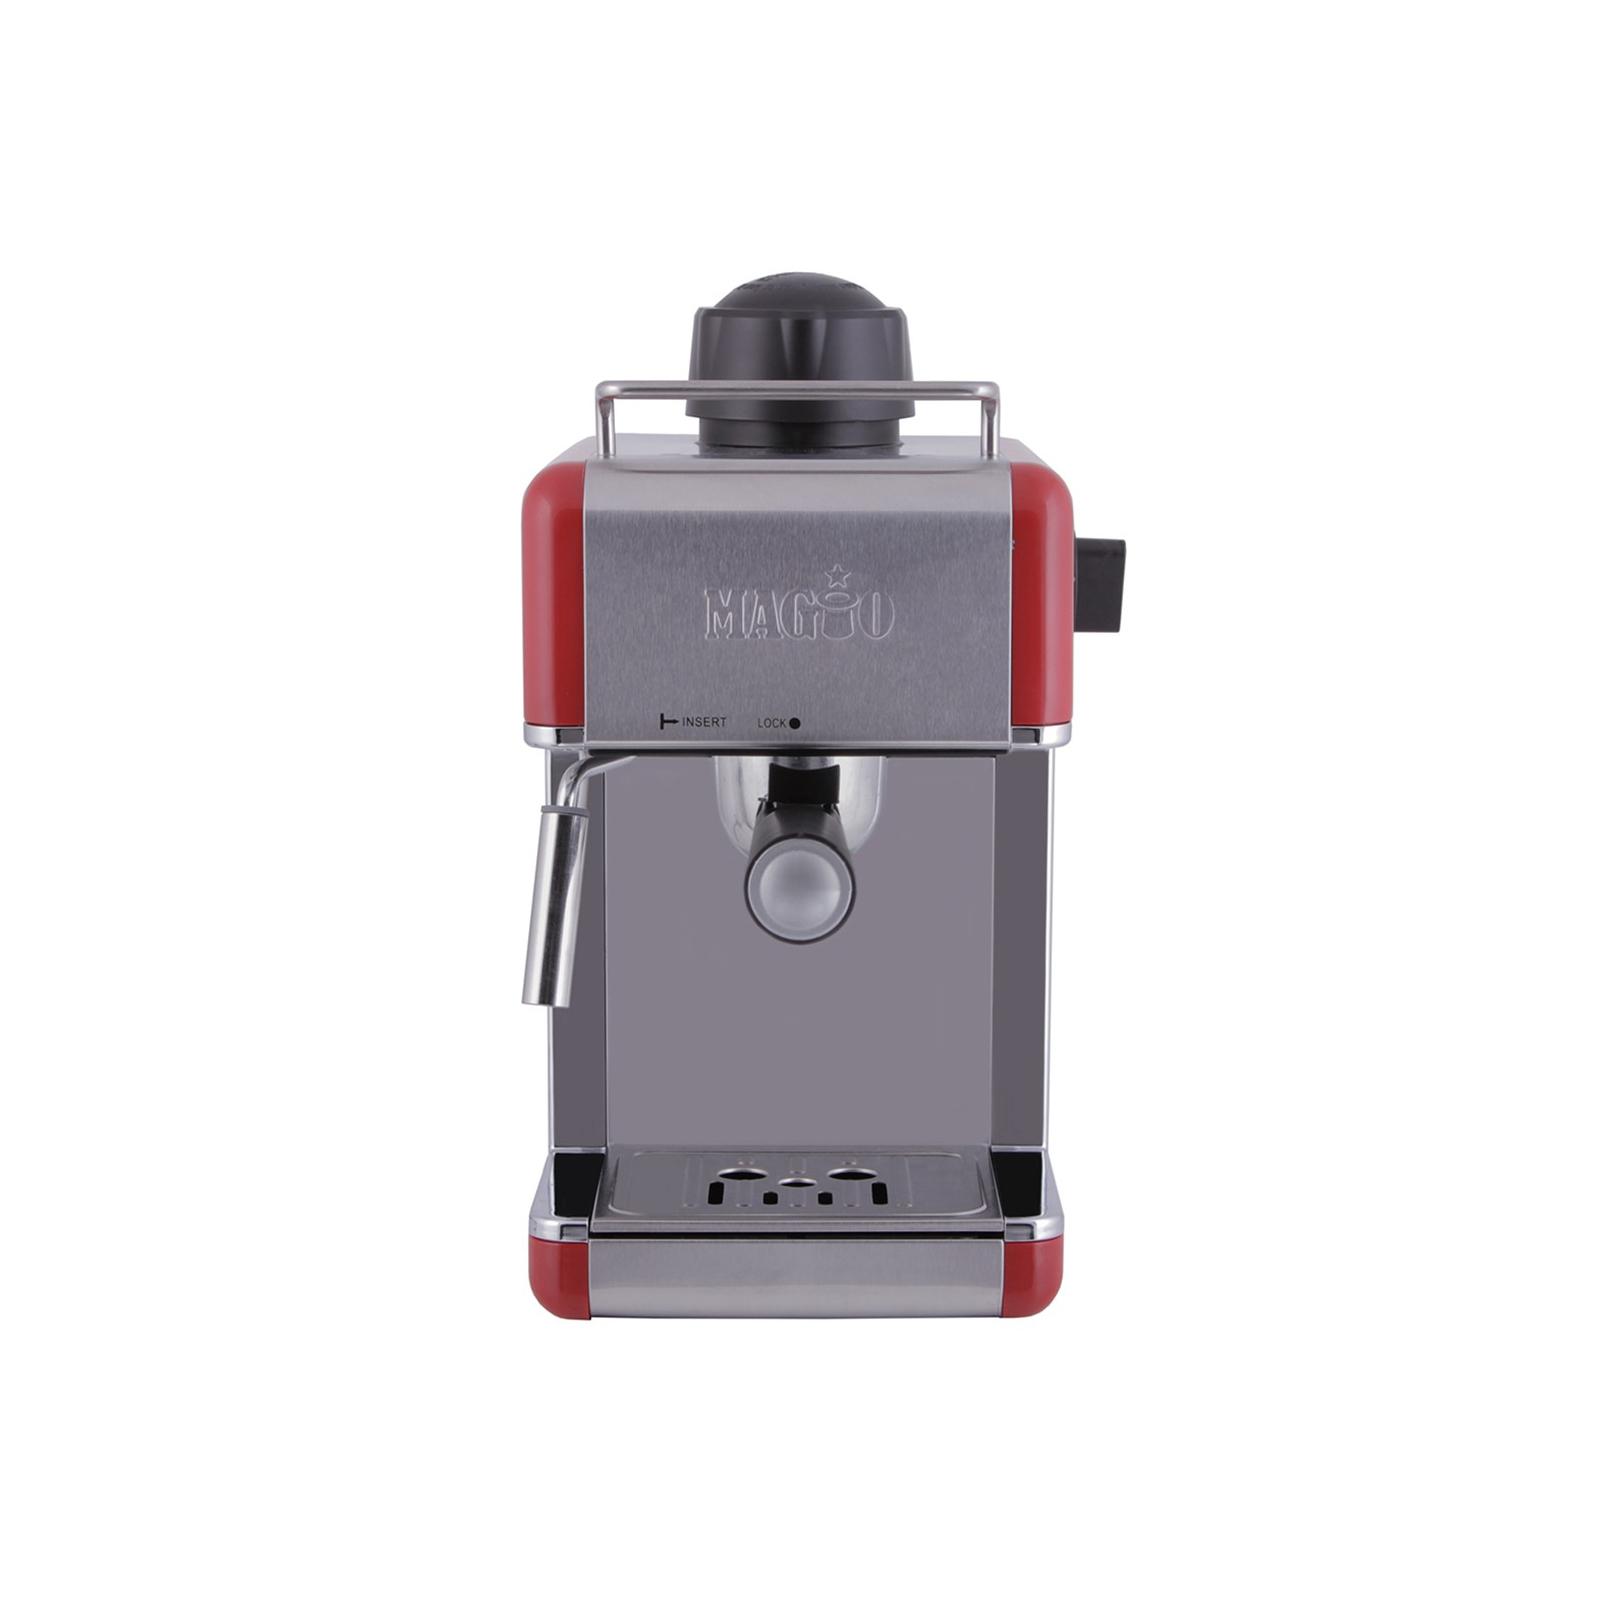 Кофеварка Magio MG-346R изображение 2